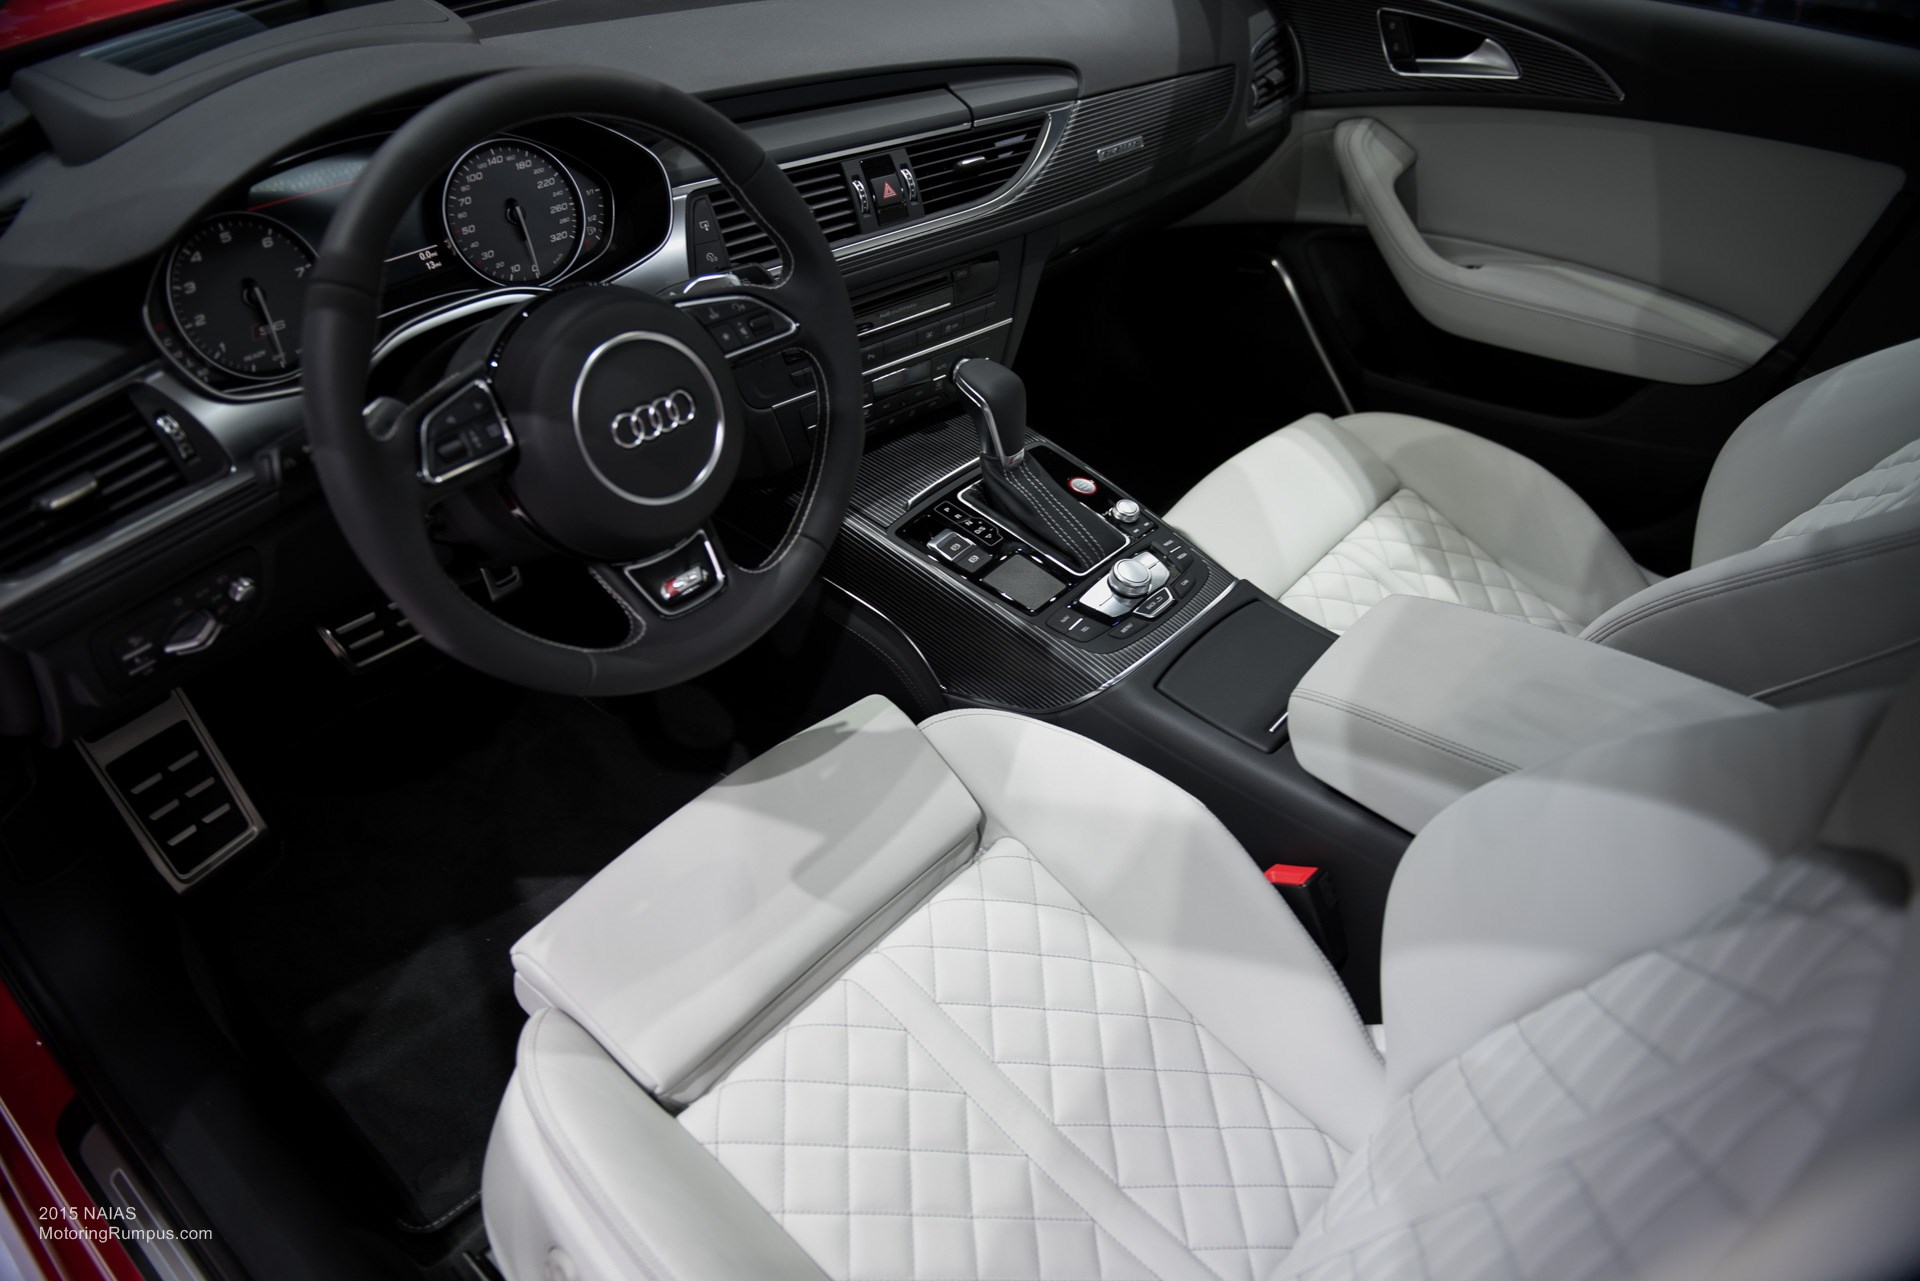 2015 NAIAS Audi S6 Light Interior